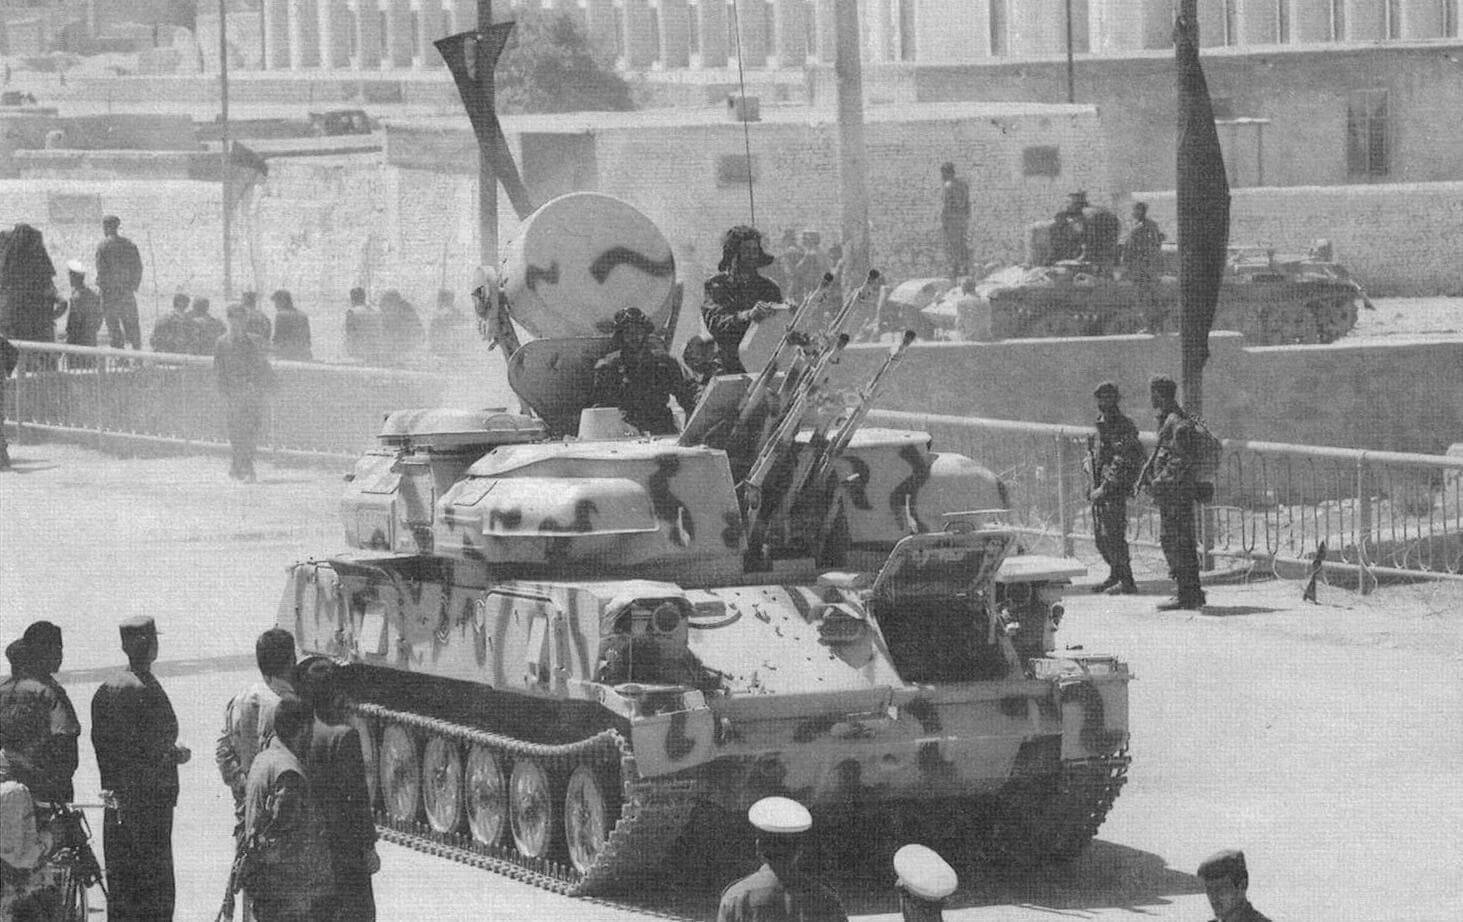 ЗСУ-23-4М армии Афганистана, 2004 год